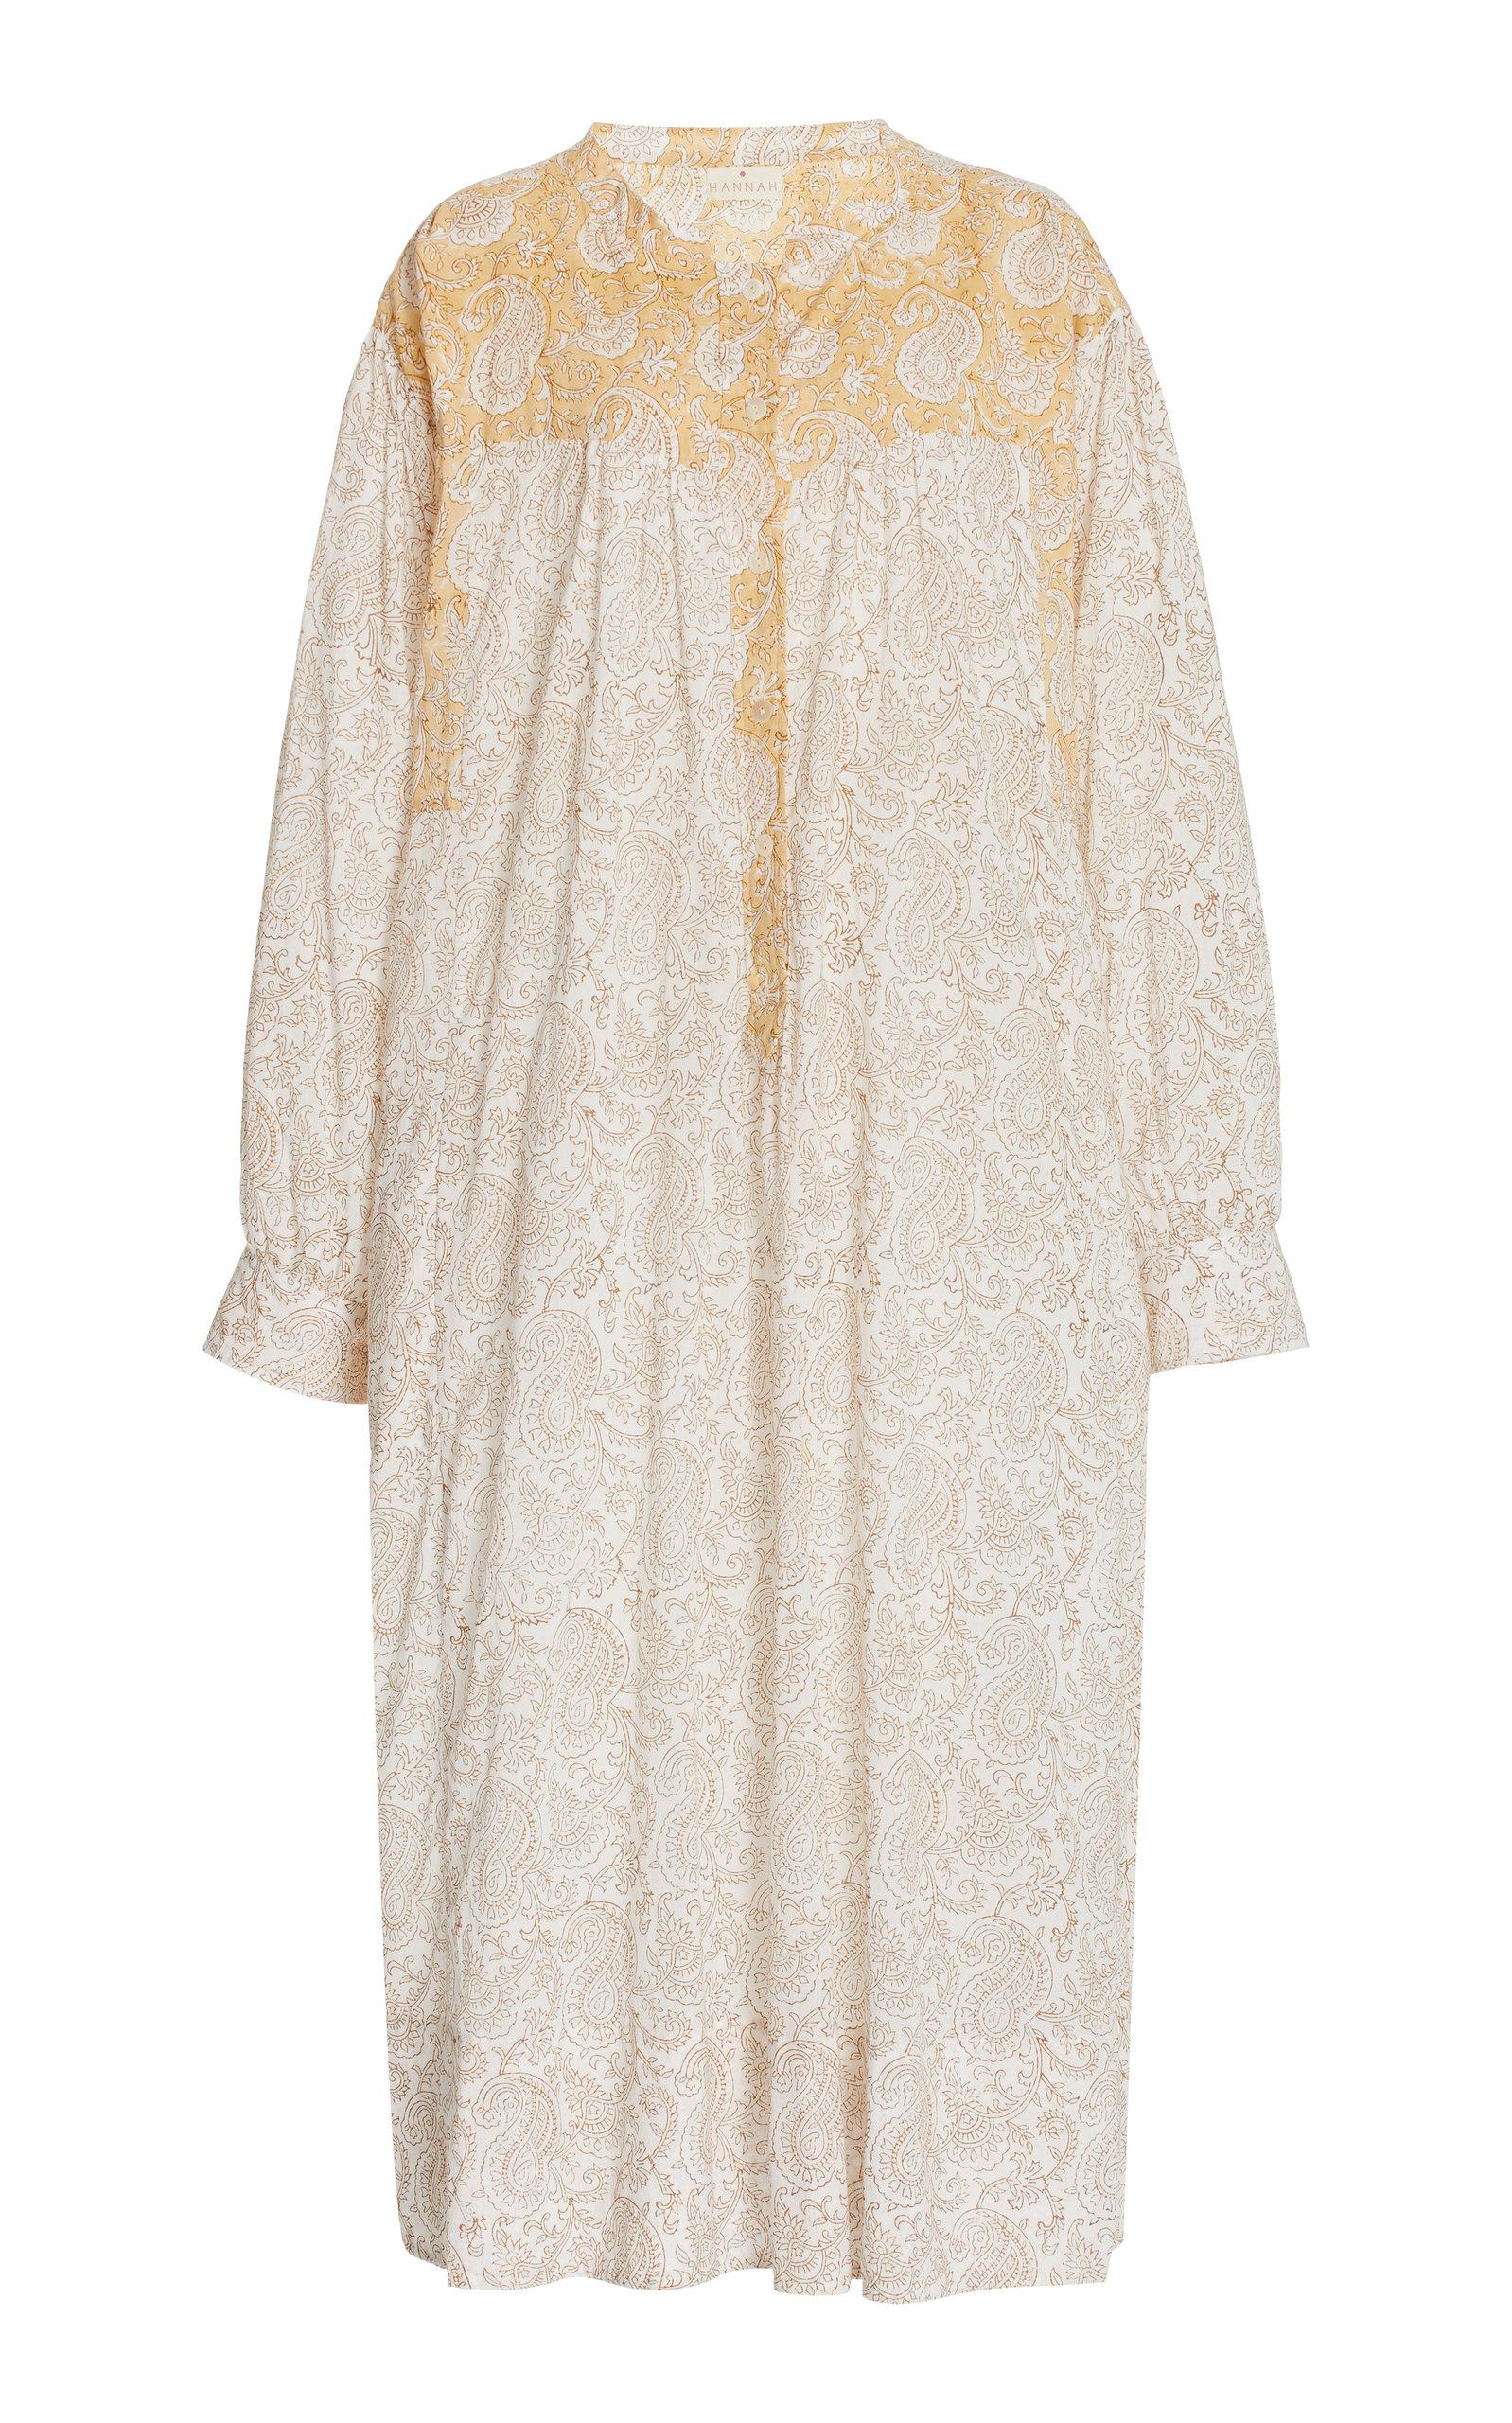 Women's Cabarita Printed Cotton Shirt Dress